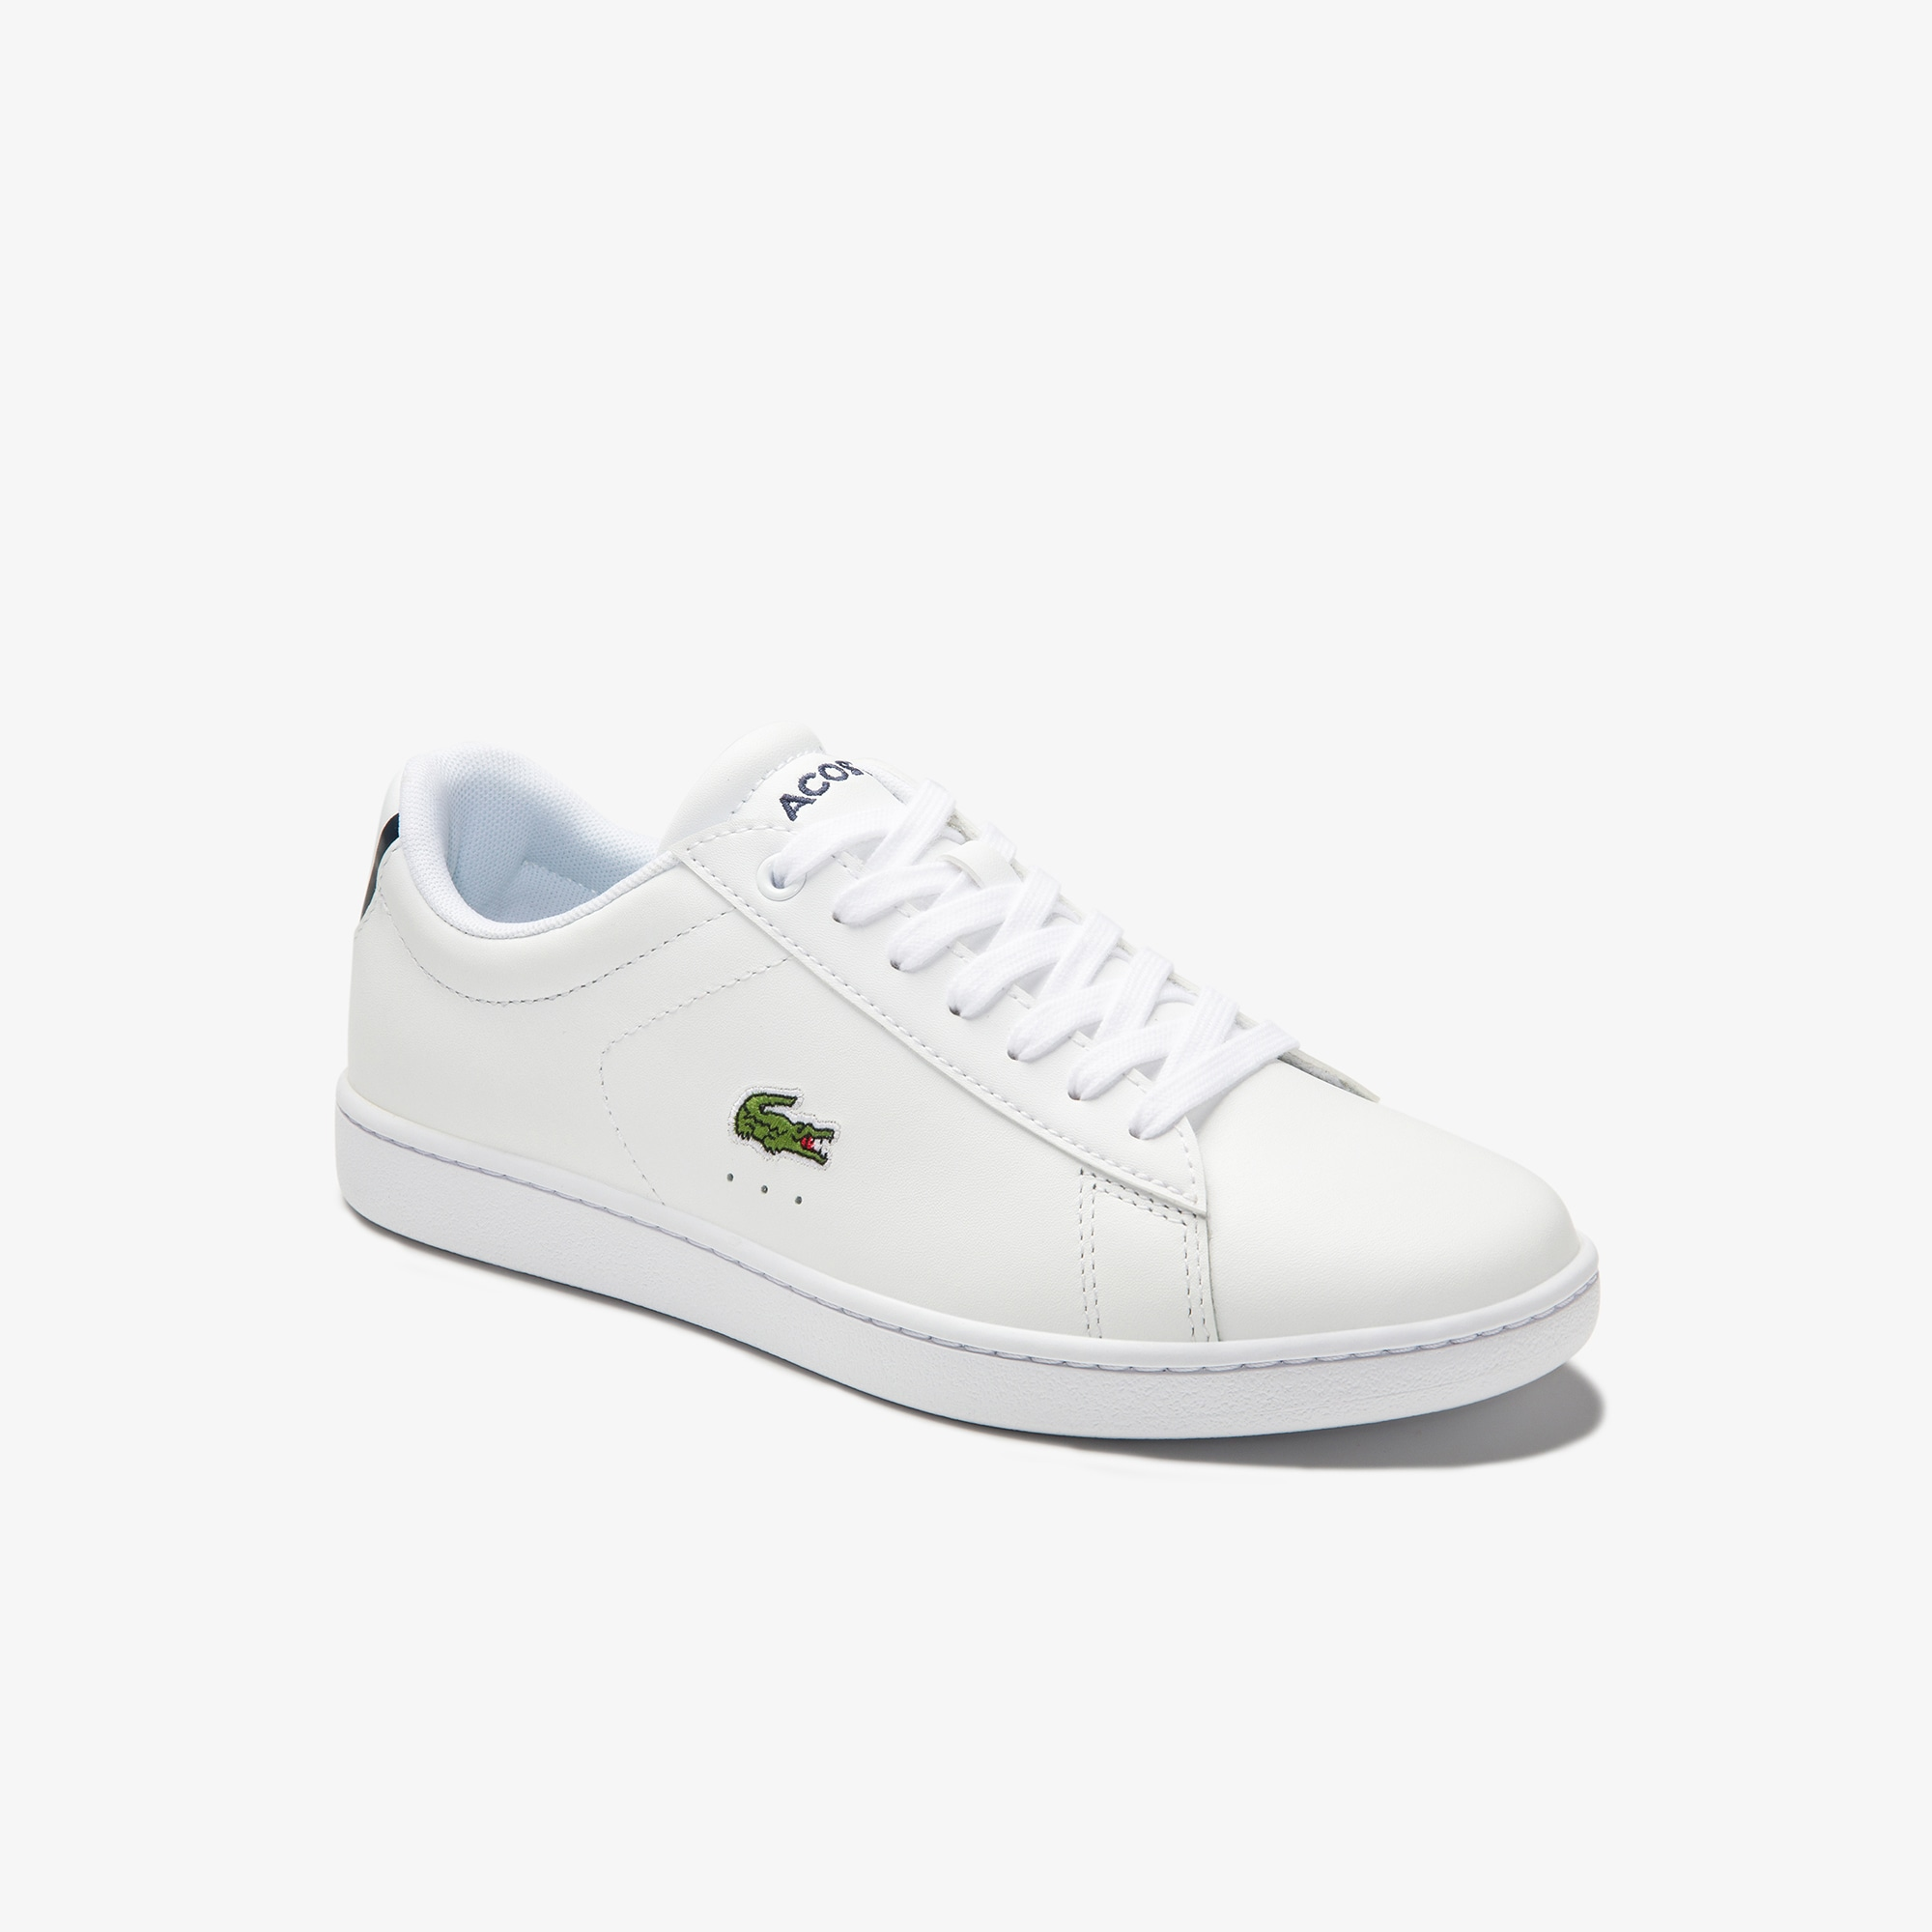 Sneakers da donna foderate in rete e in pelle Carnaby Evo